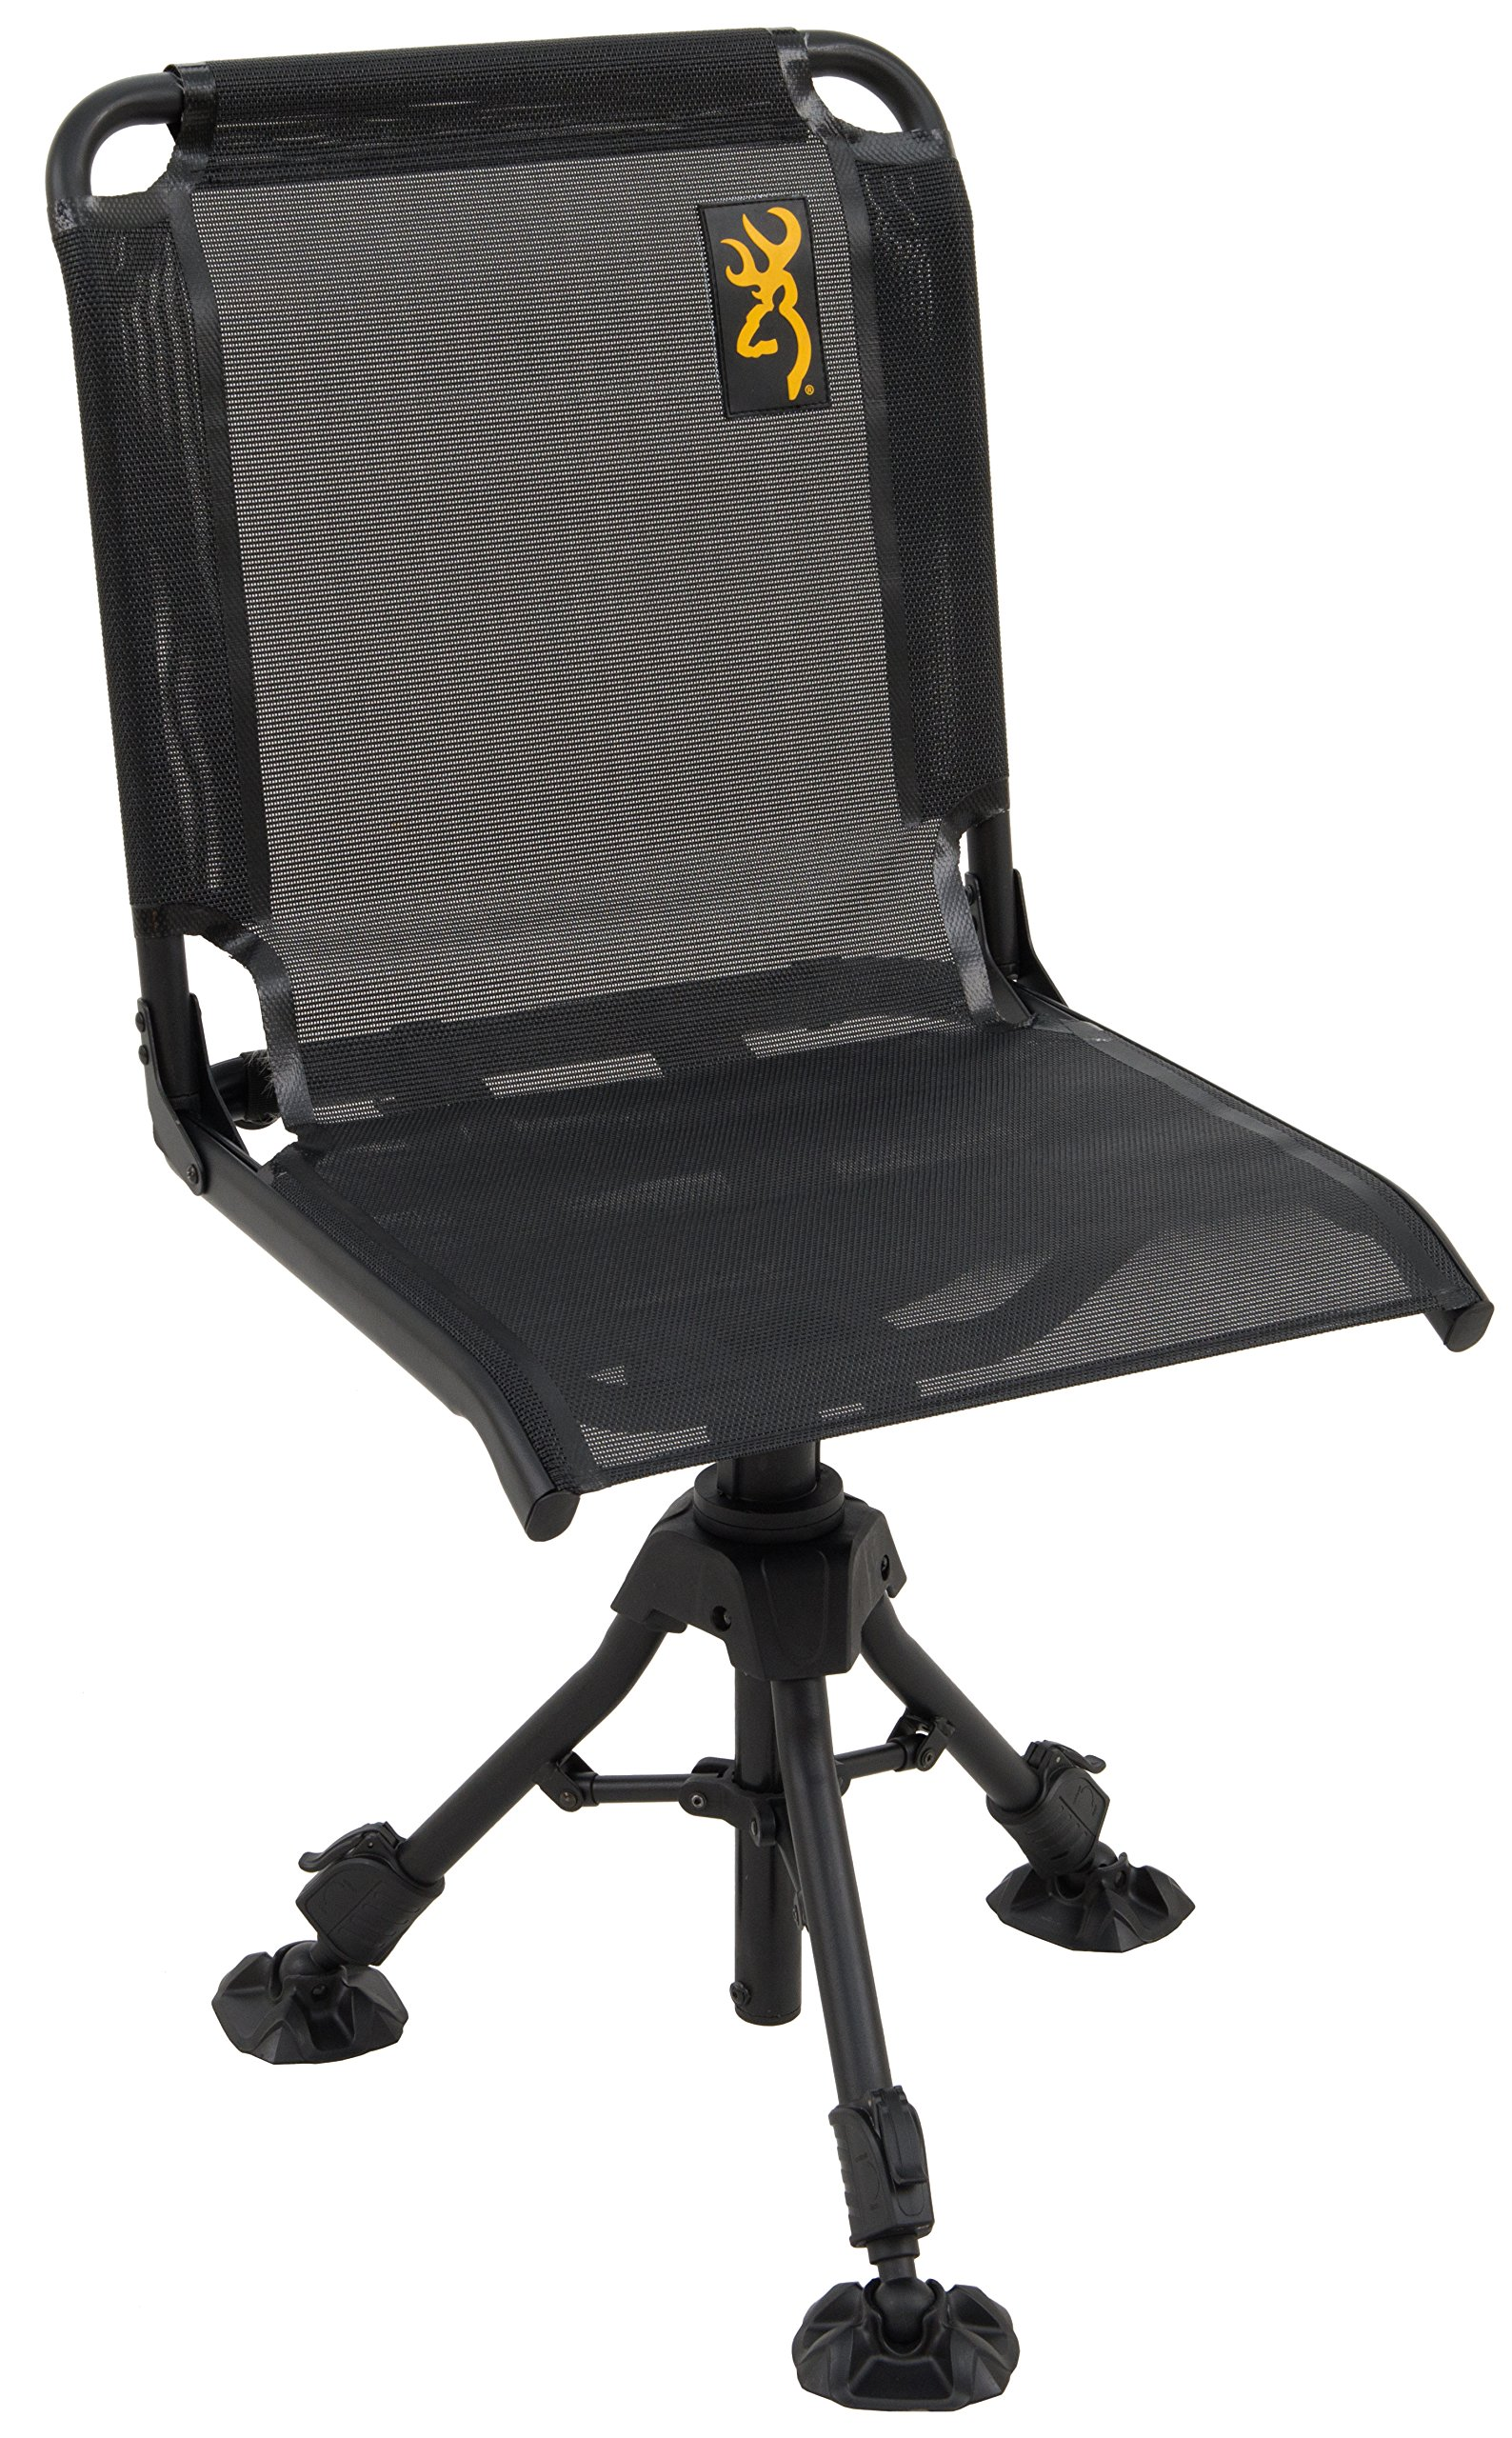 Browning Camping Huntsman Chair by Browning Camping